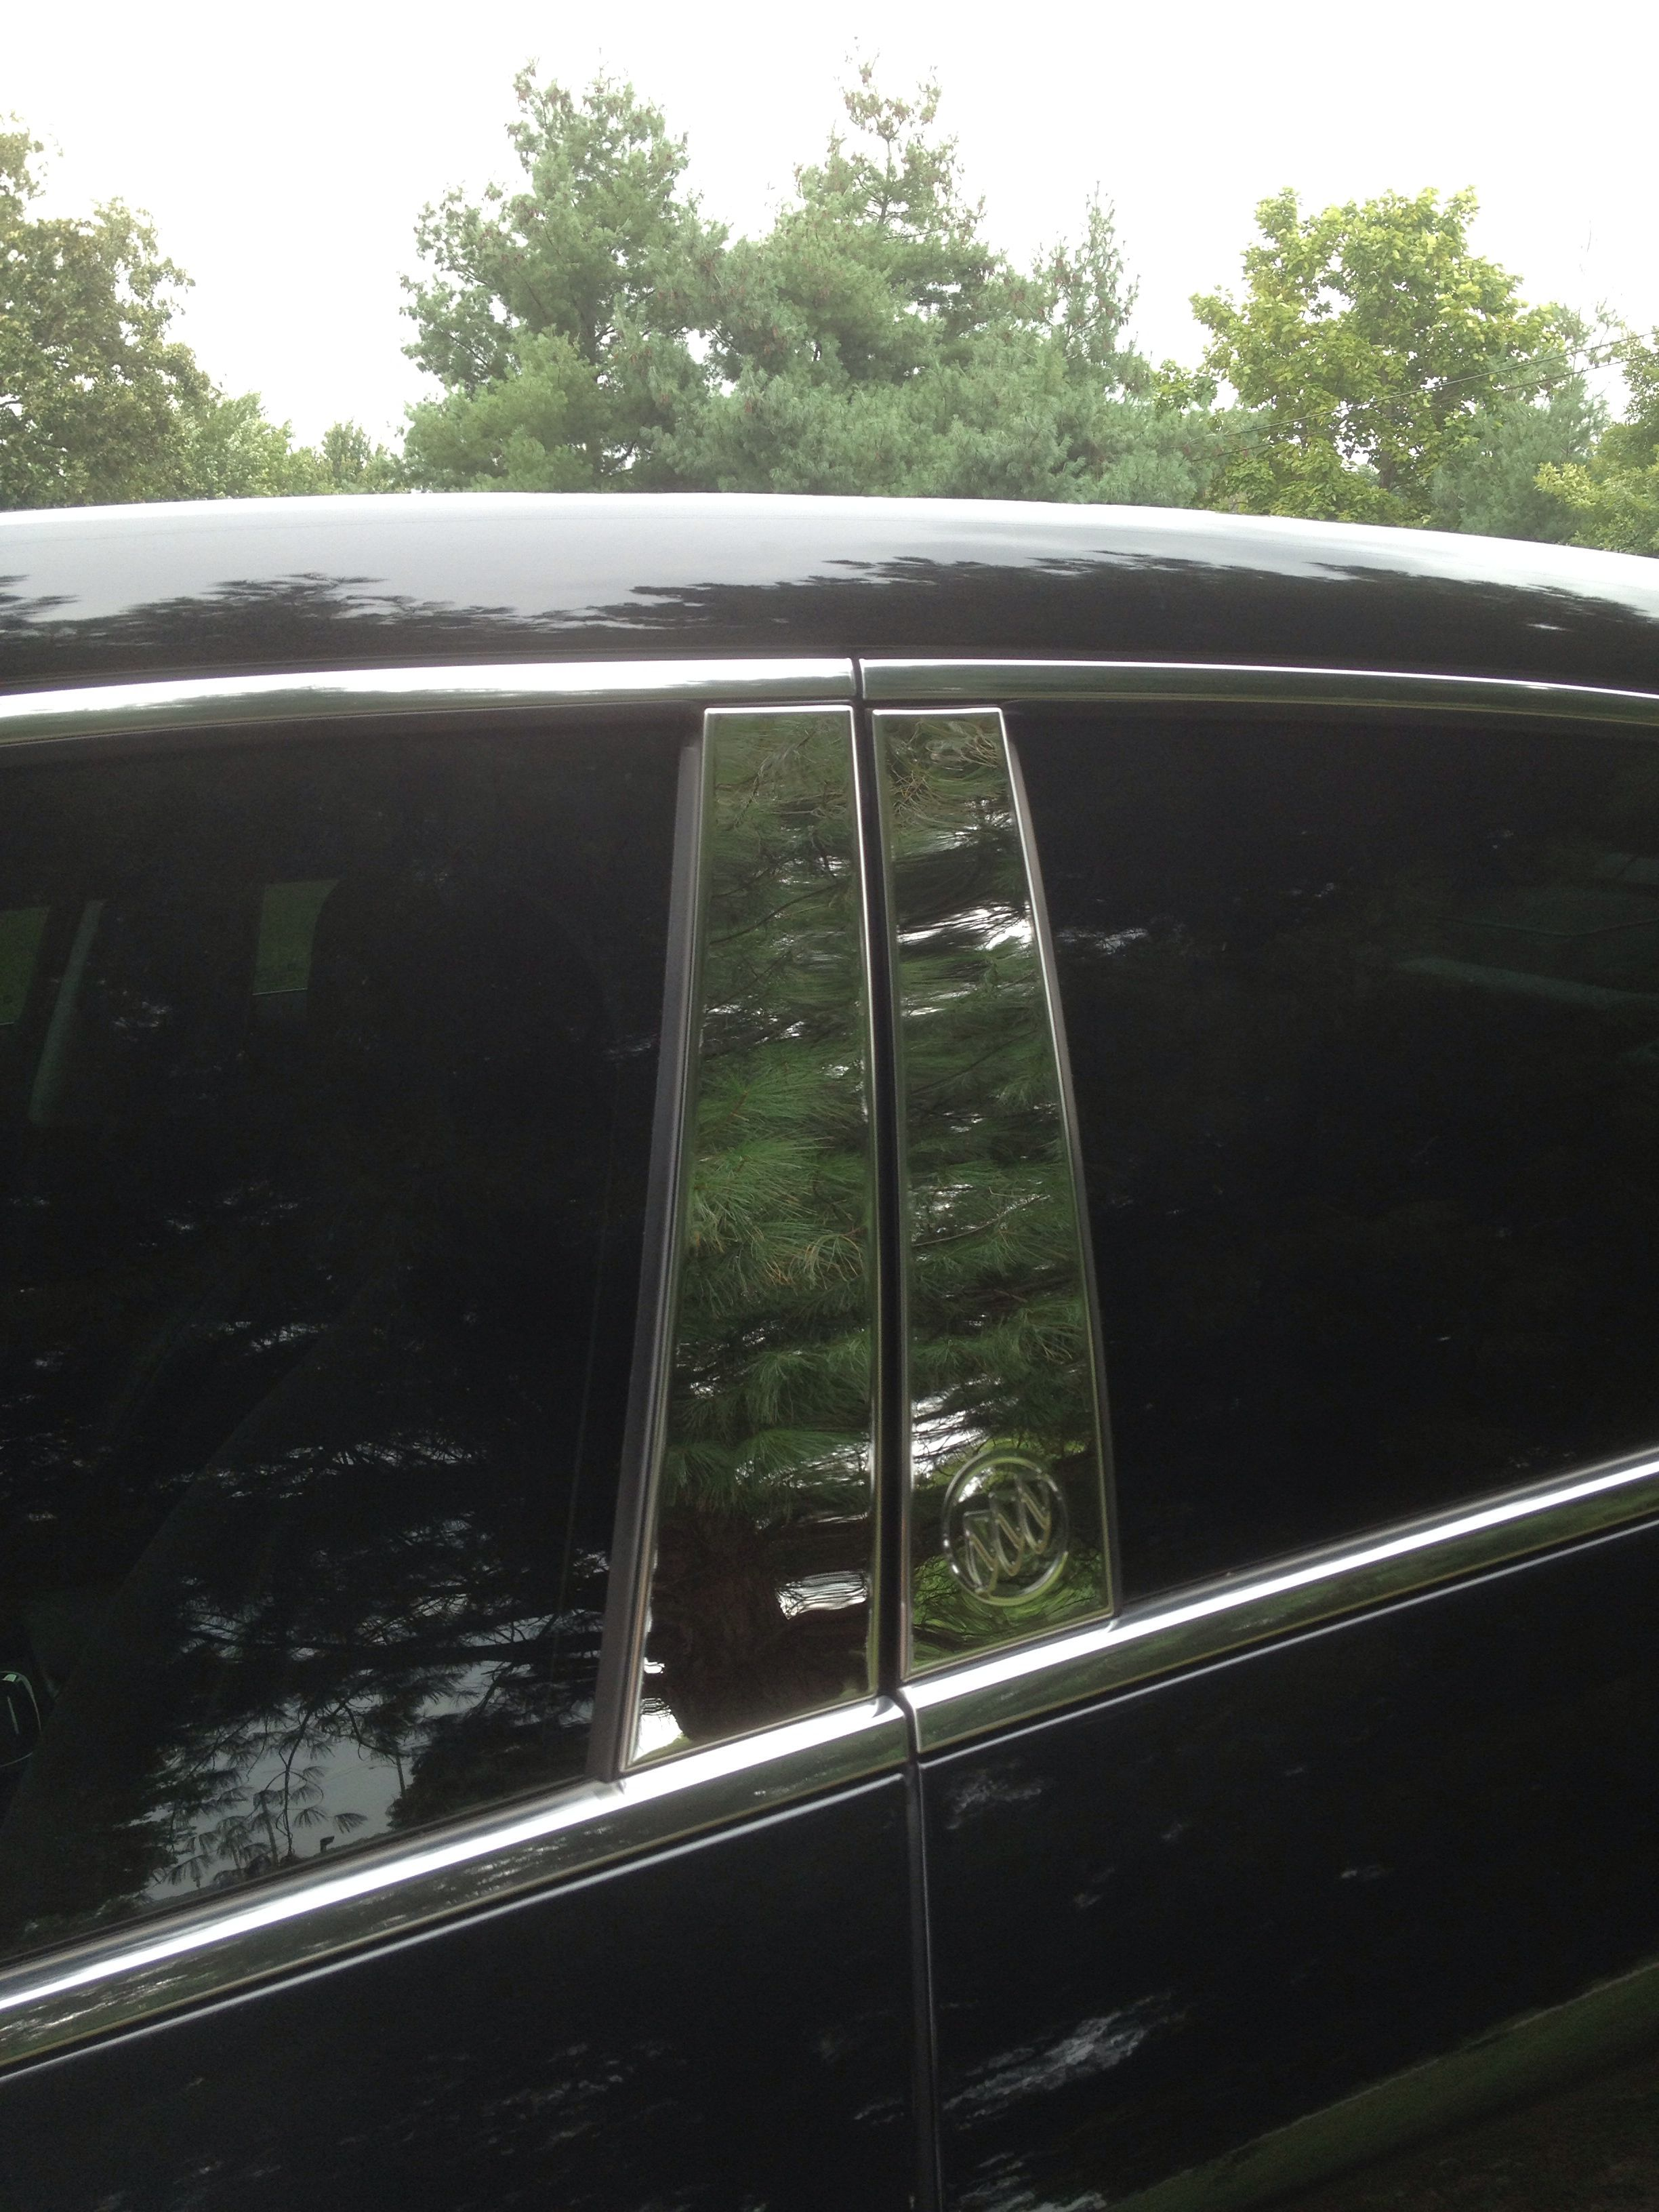 2011 Buick Lacrosse Cxs Chrome Door Pillar Covers 2011 Buick Lacrosse Buick Lacrosse Best Luxury Cars